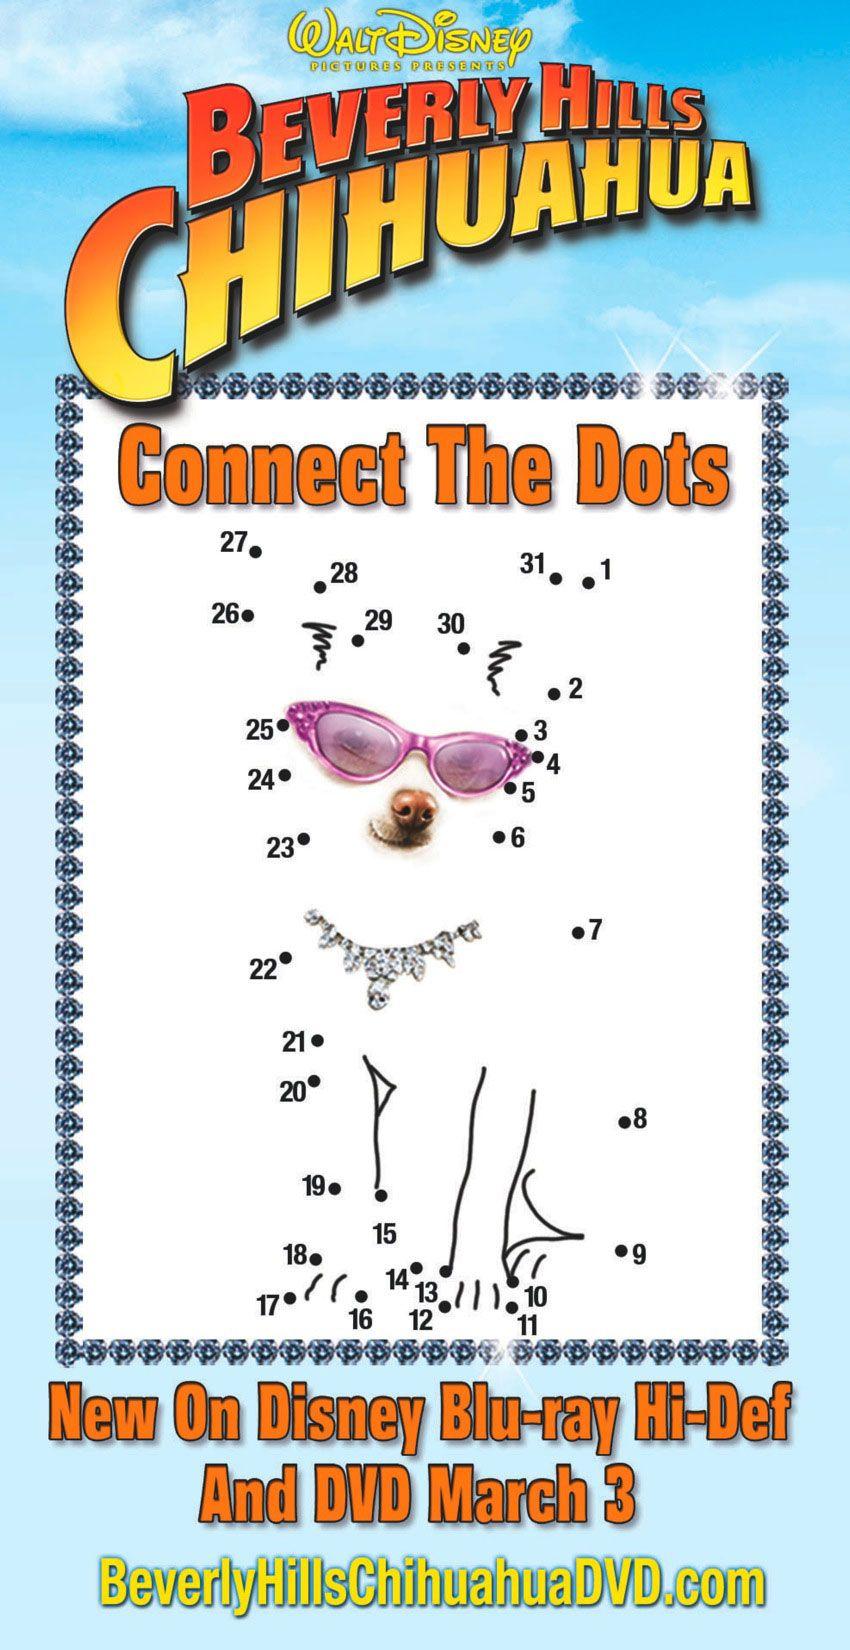 Beverly Hills Chihuahua - Chloe Dot to Dot | Chihuahuas! | Pinterest